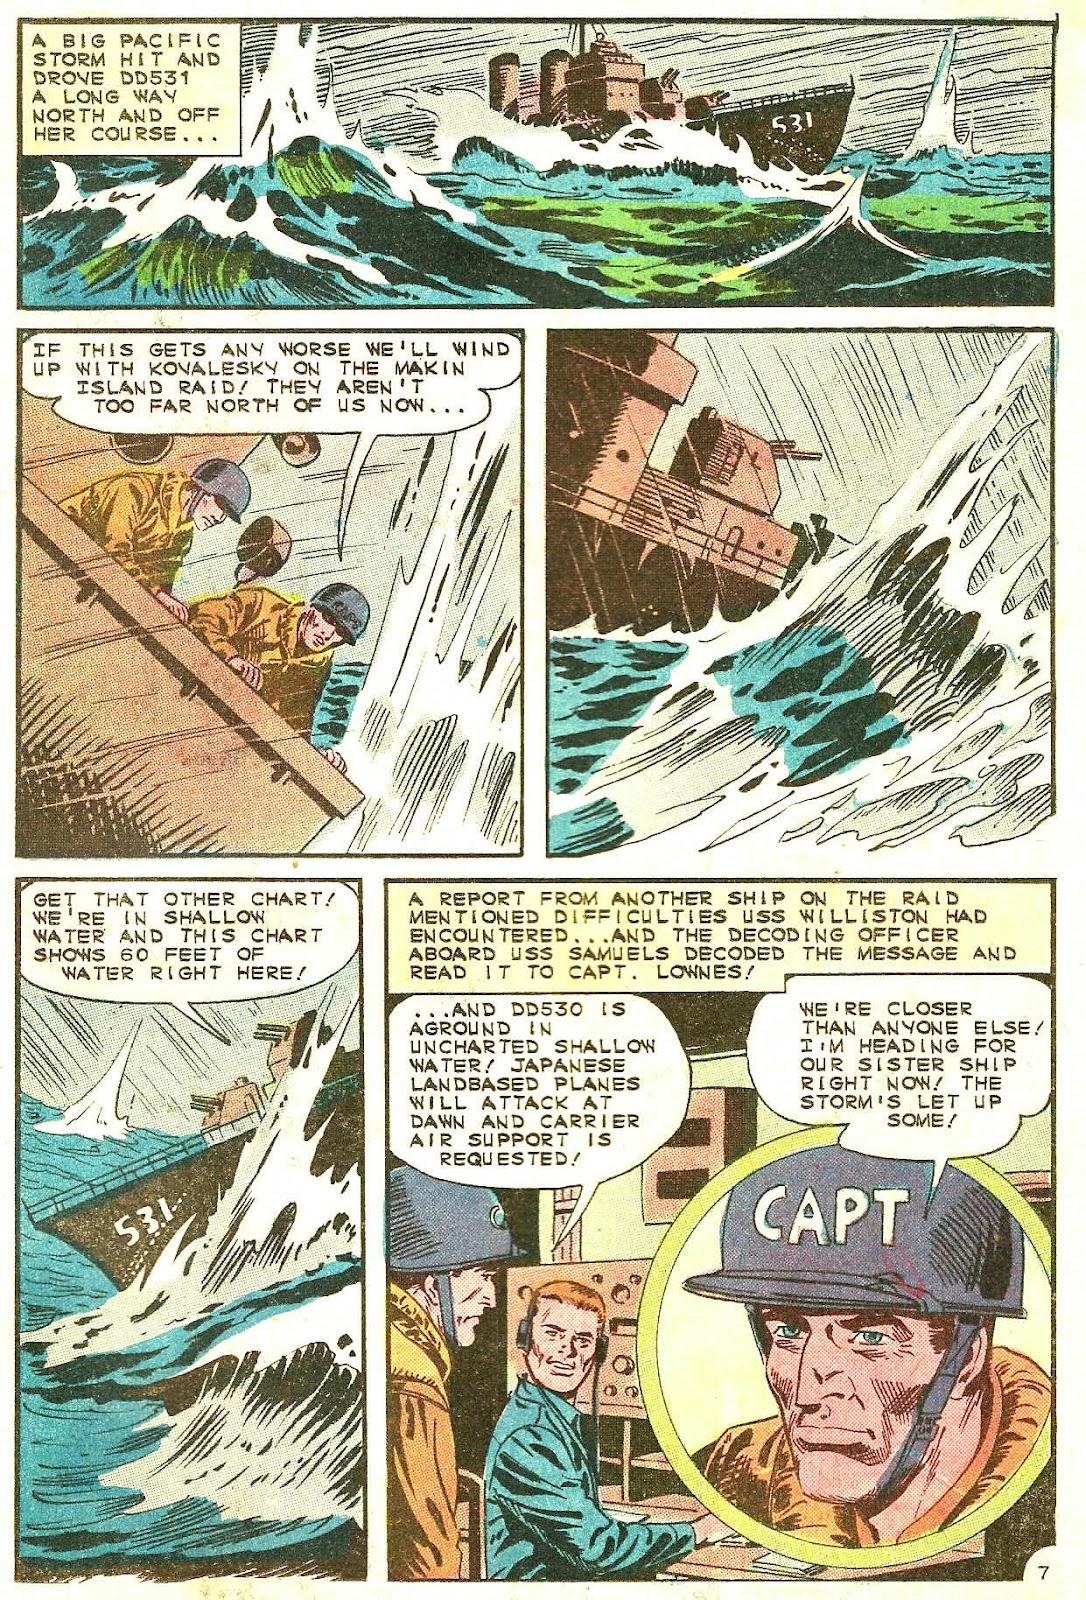 Read online Fightin' Navy comic -  Issue #125 - 21